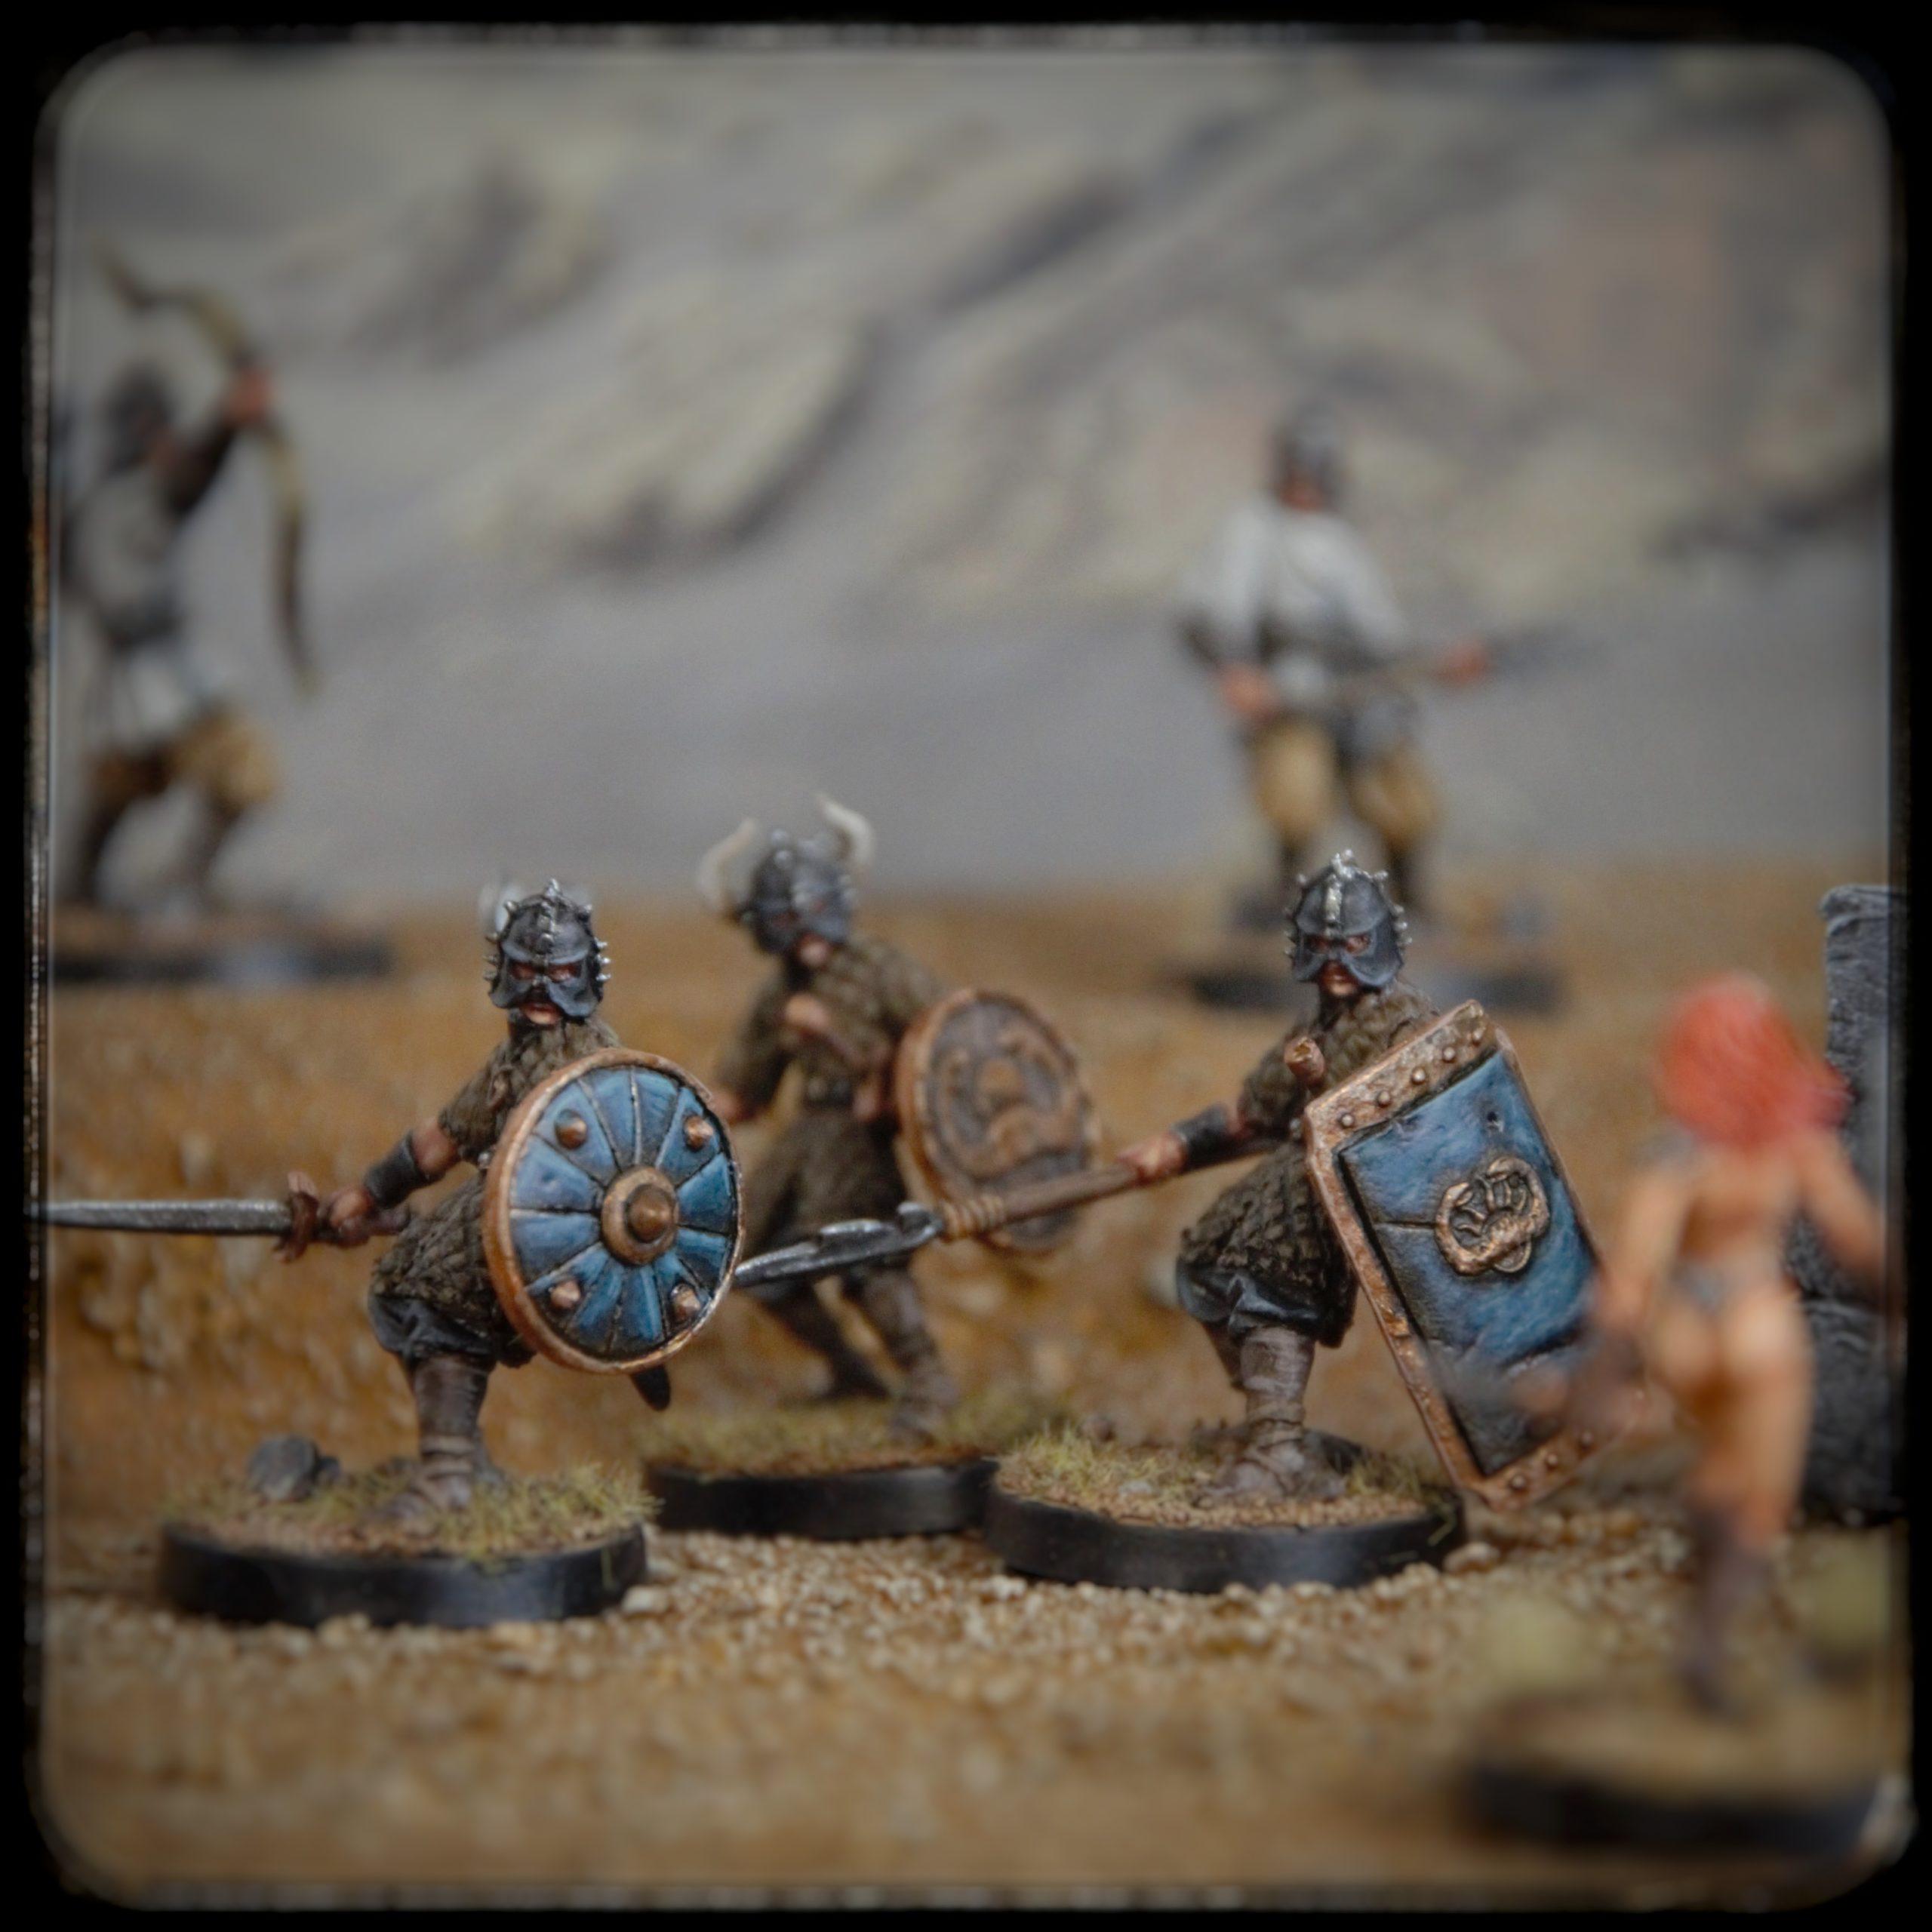 Serpent Warriors, Conan the Barbarian, Forge of Doom Miniatures